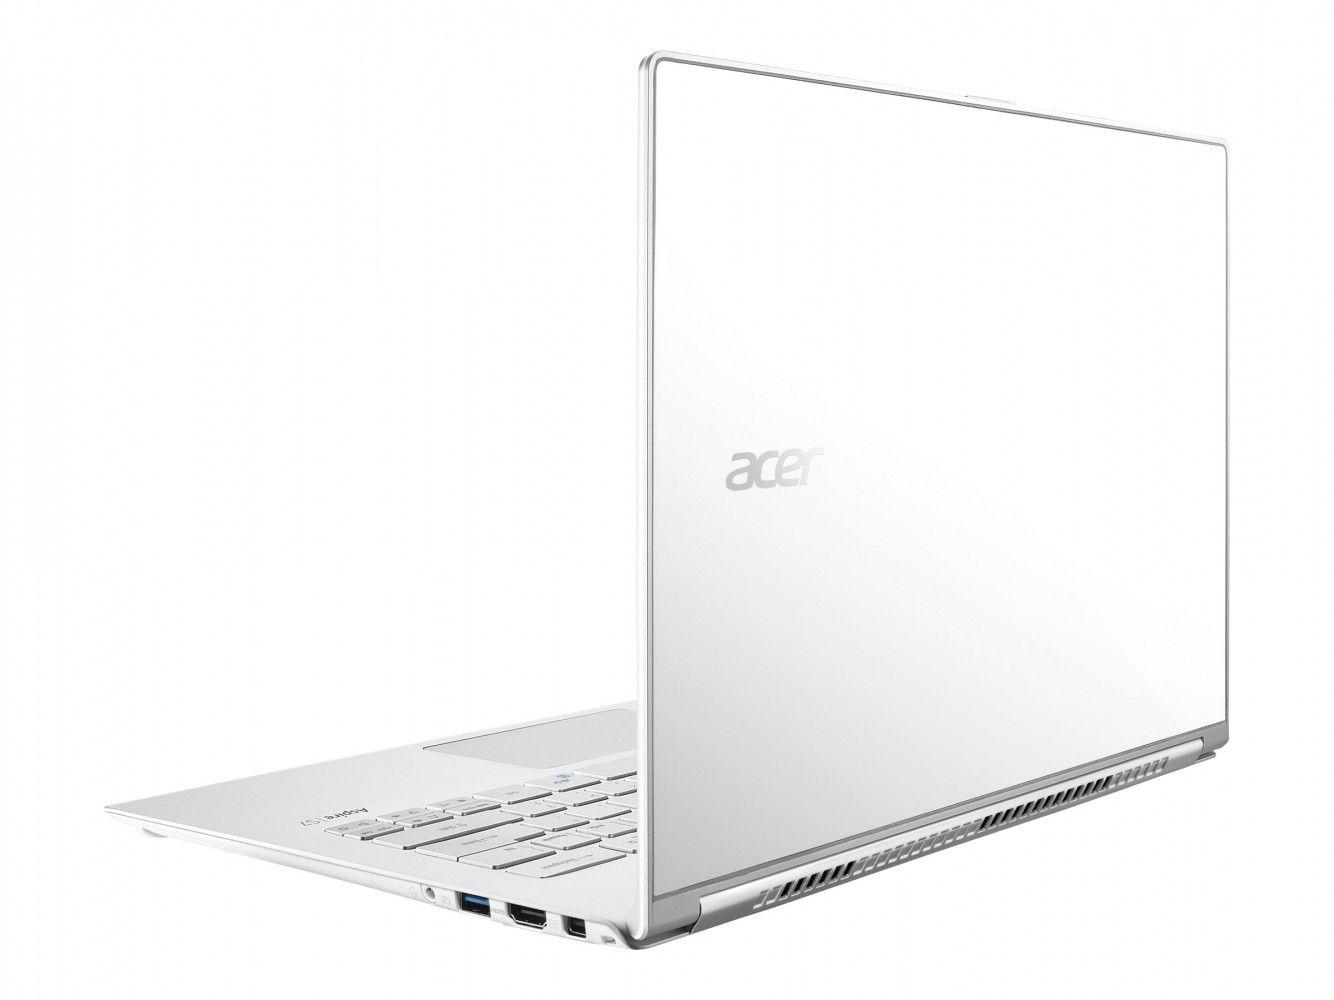 Ноутбук ACER Aspire S7-393-75508G25ews (NX.MT2EU.009) - 1